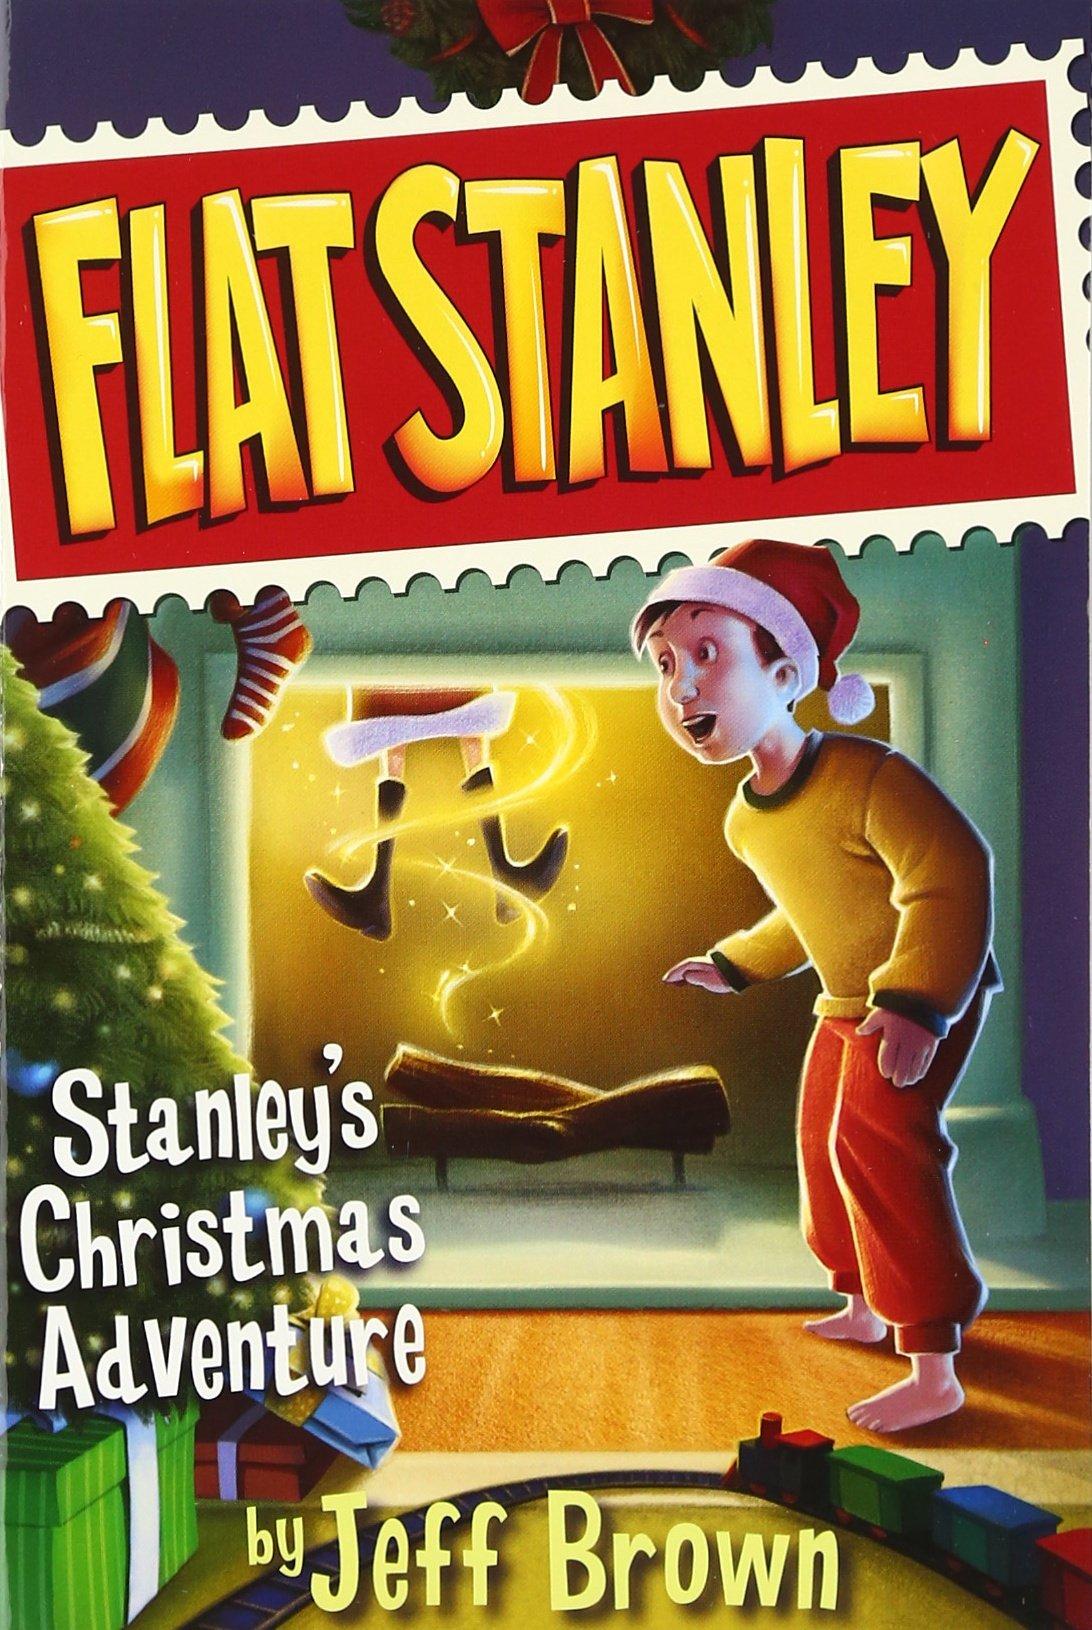 Stanleys Christmas Adventure Flat Stanley product image